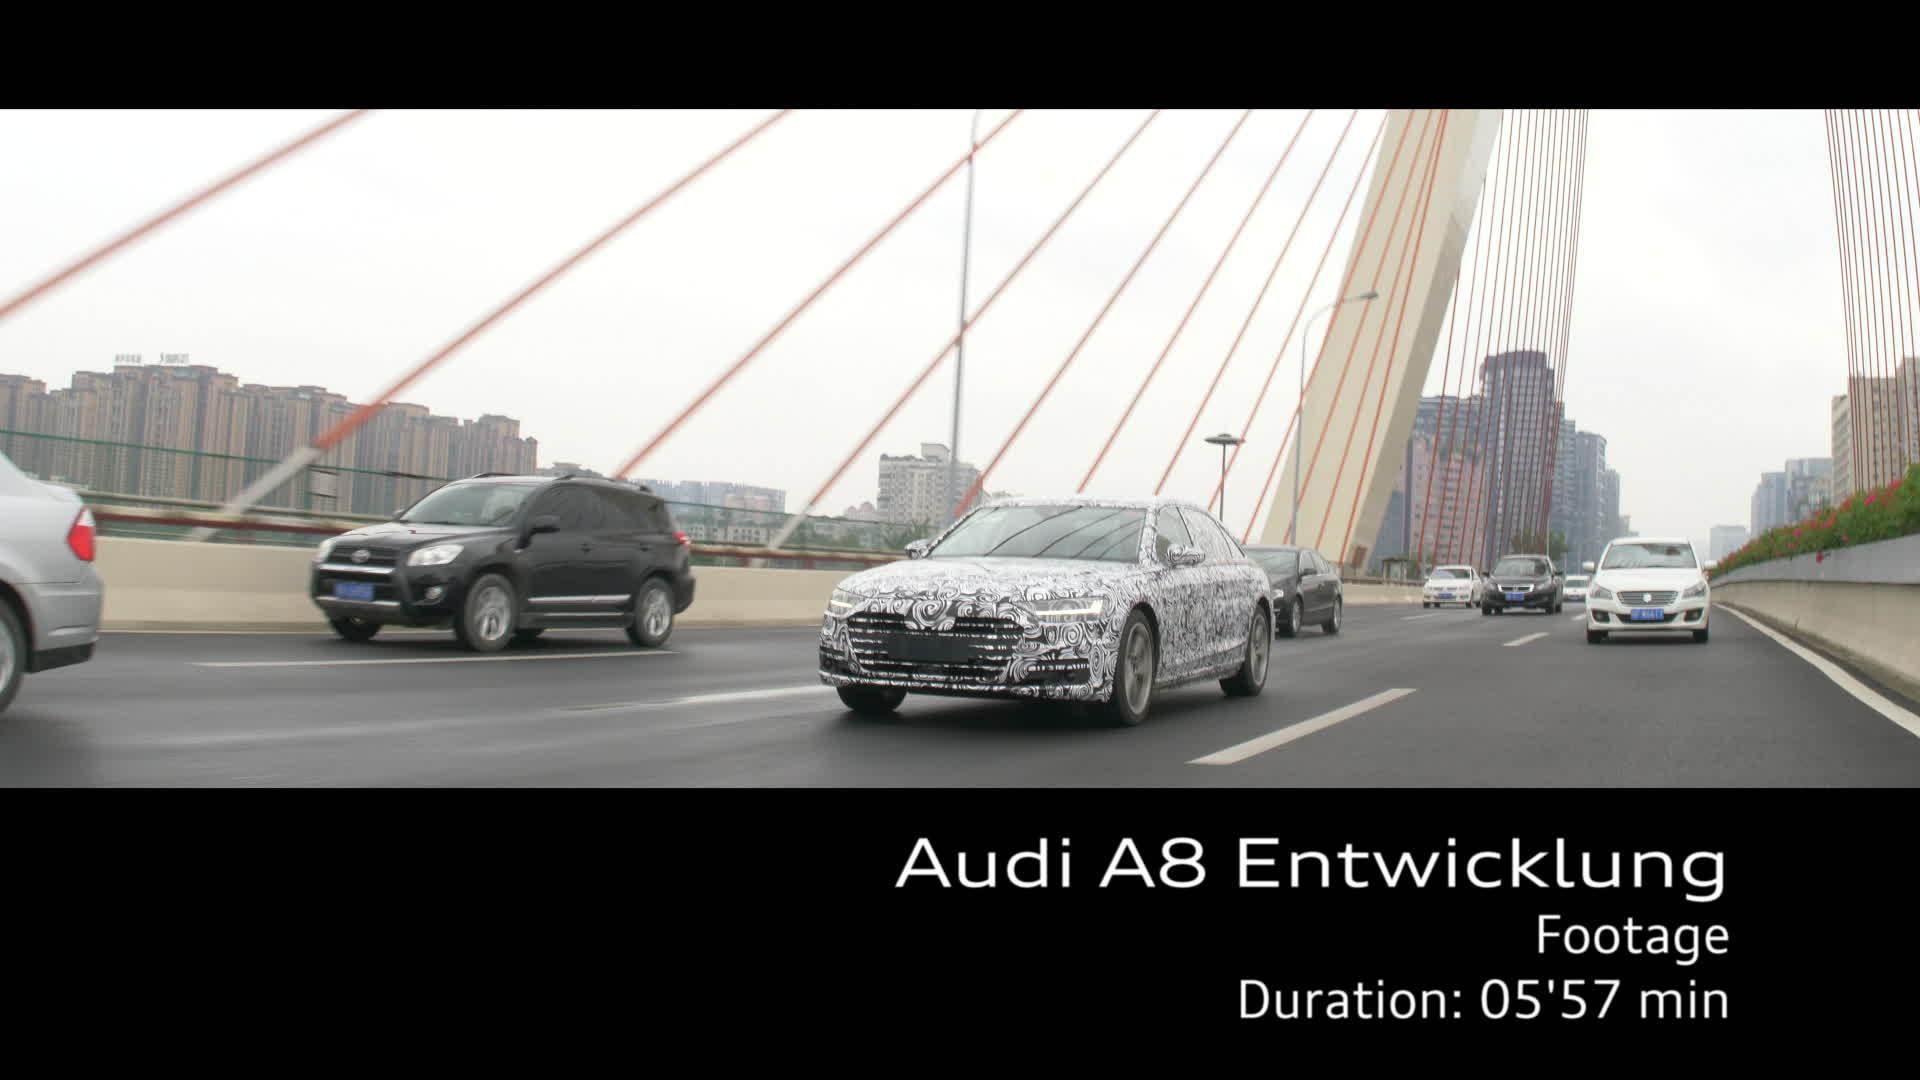 Audi A8 Footage Entwicklung